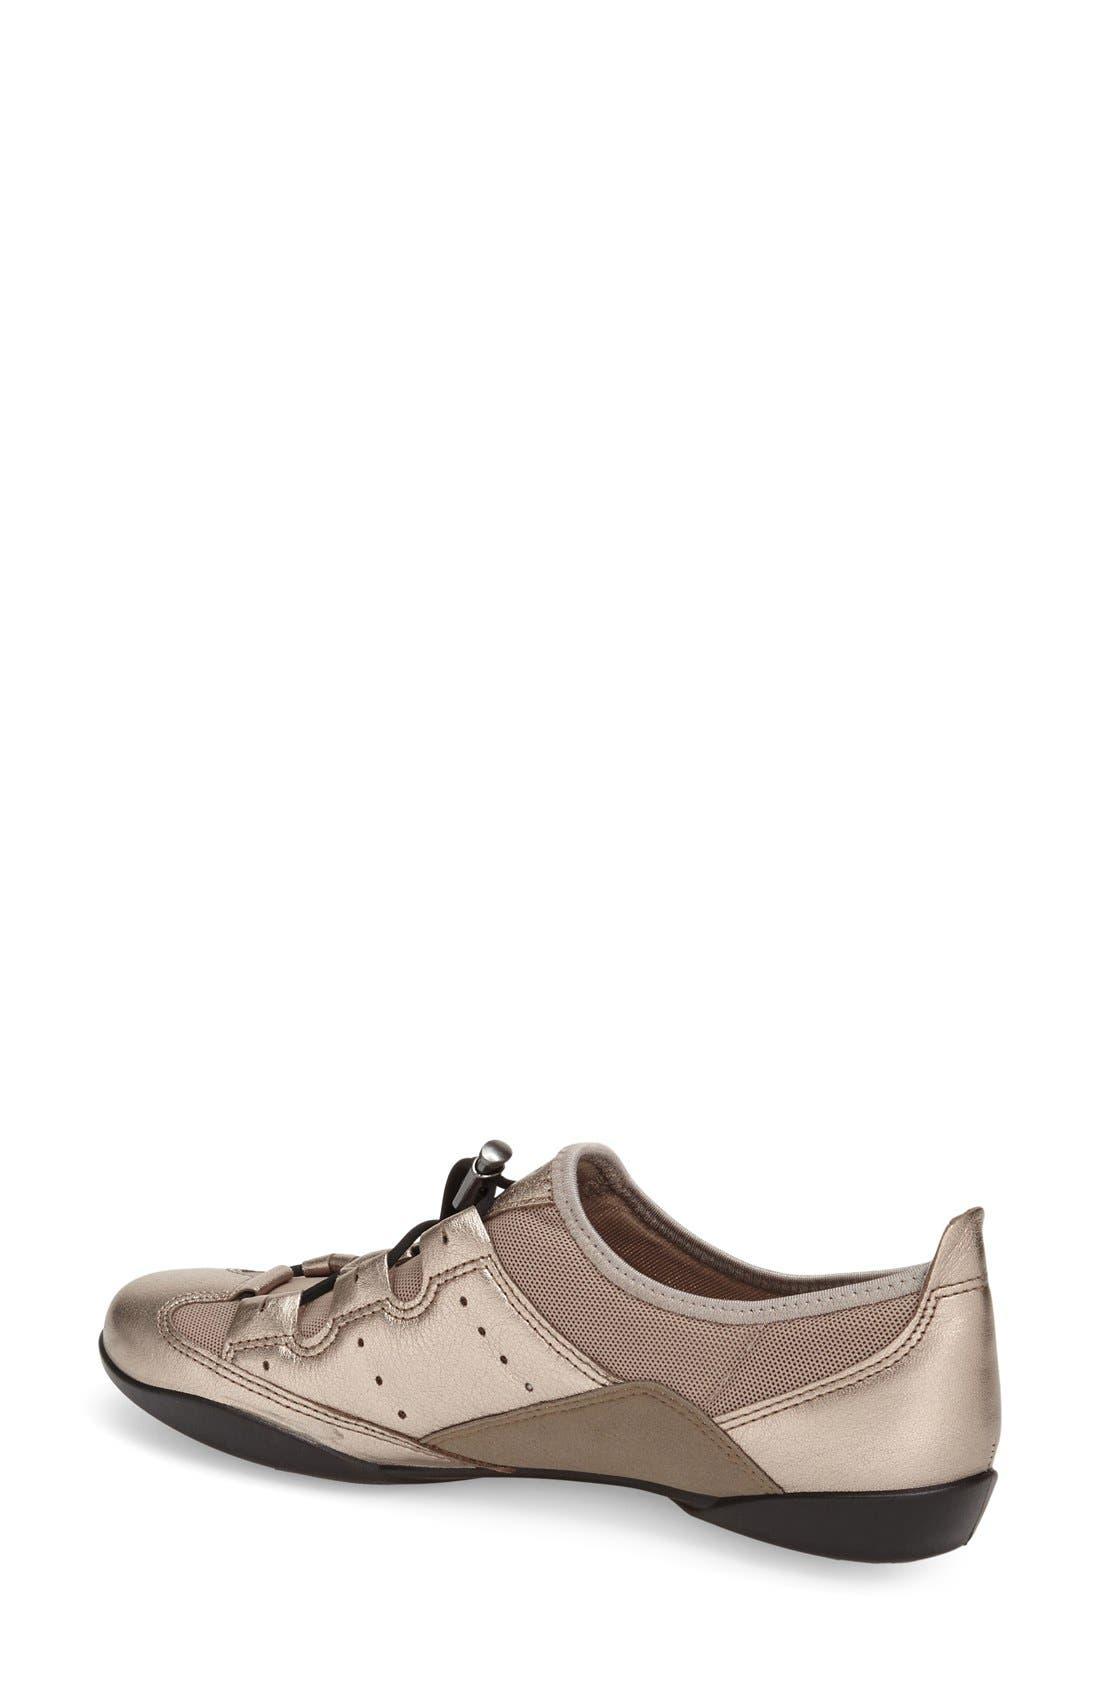 'Bluma' Sneaker,                             Alternate thumbnail 2, color,                             Grey Leather Fabric